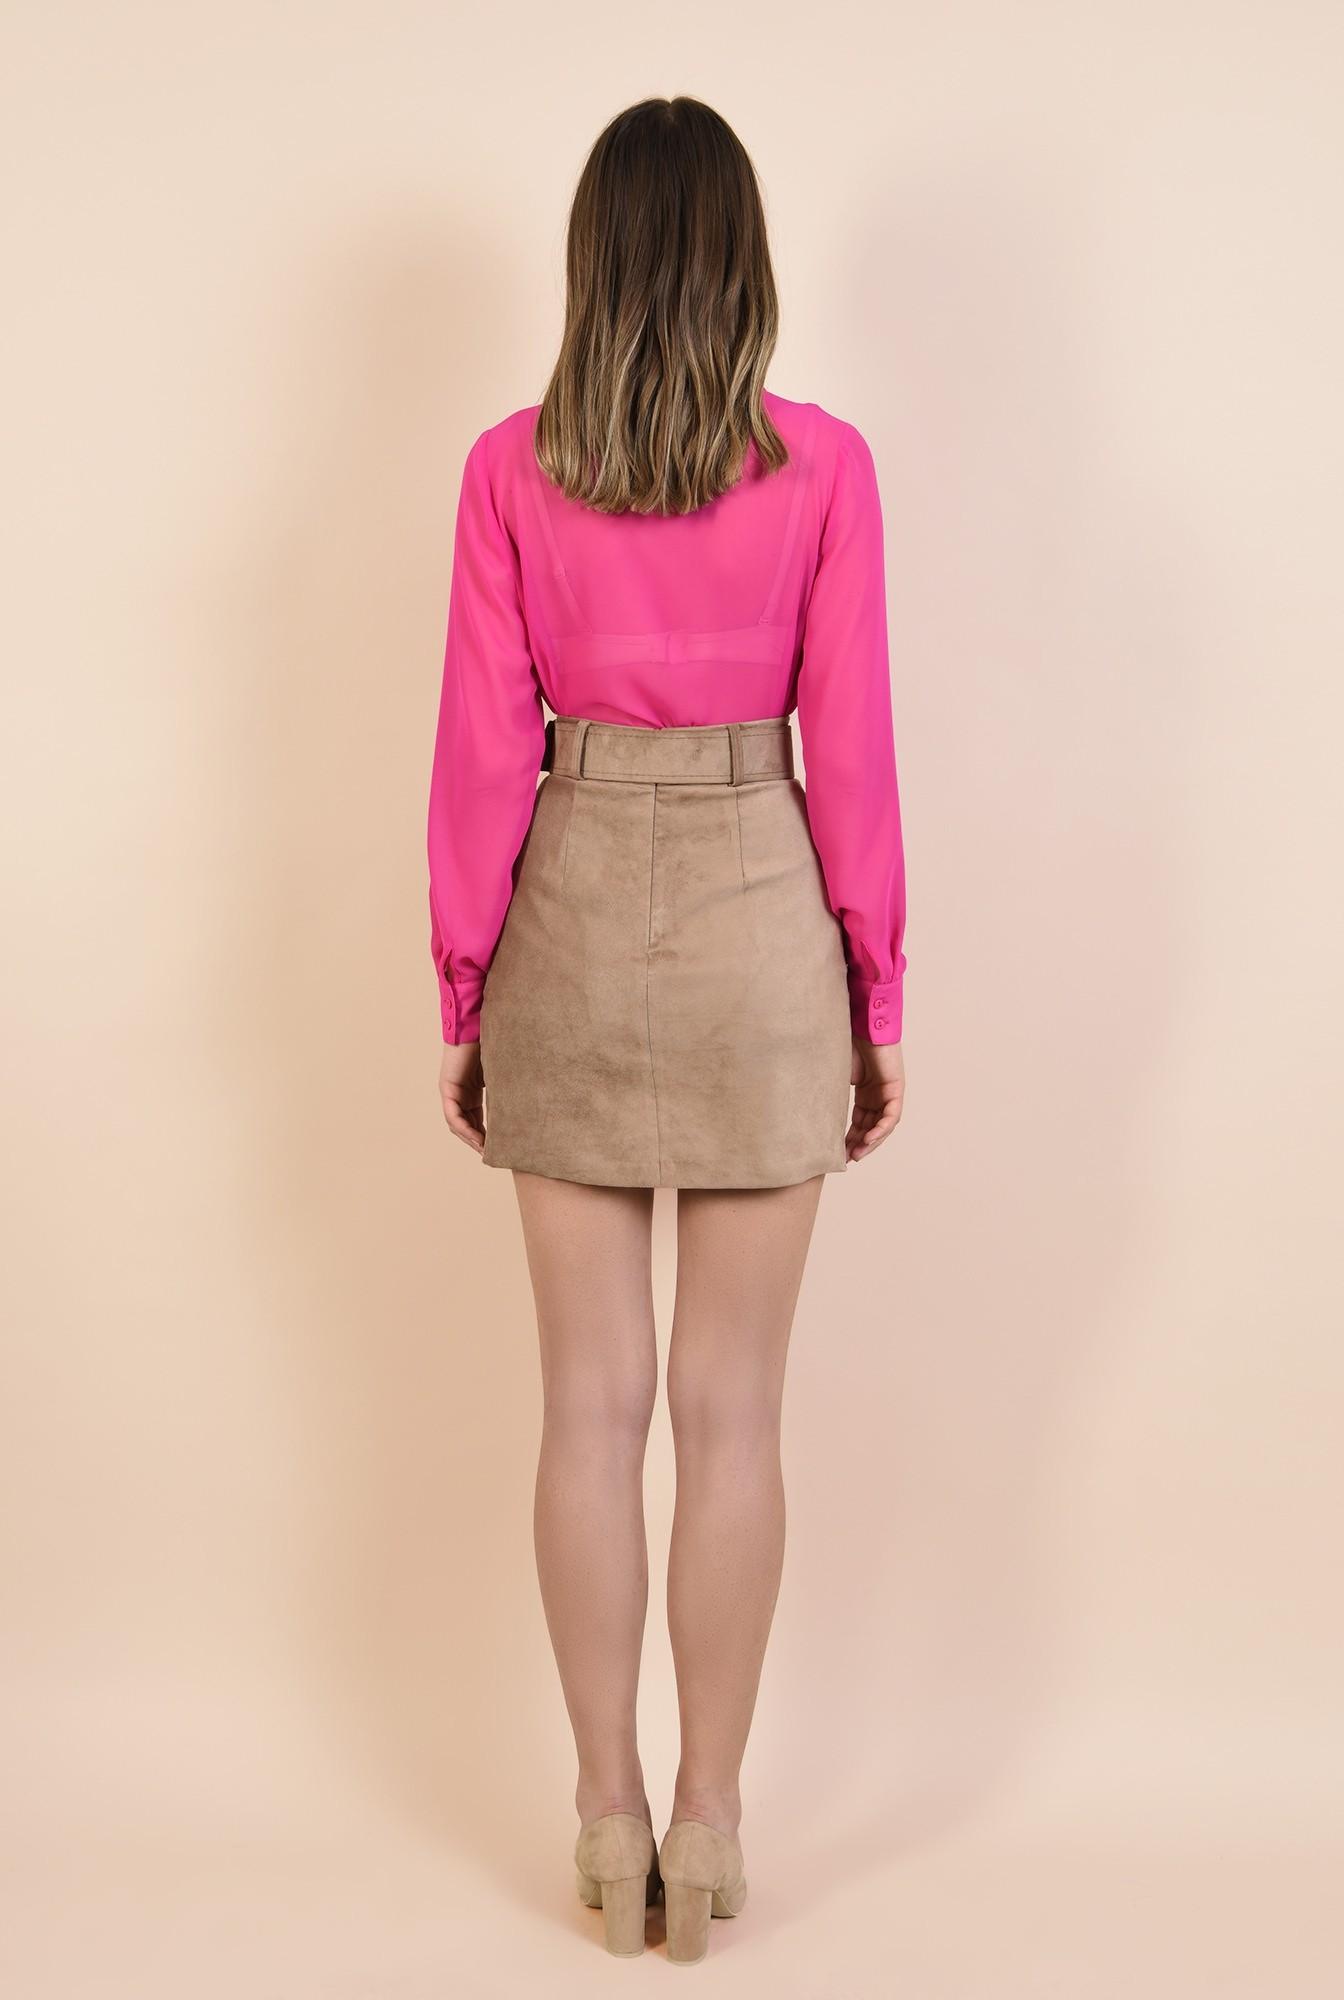 1 - camasa roz, cu buzunare la piept, maneci lungi, guler ascutit, nasturi